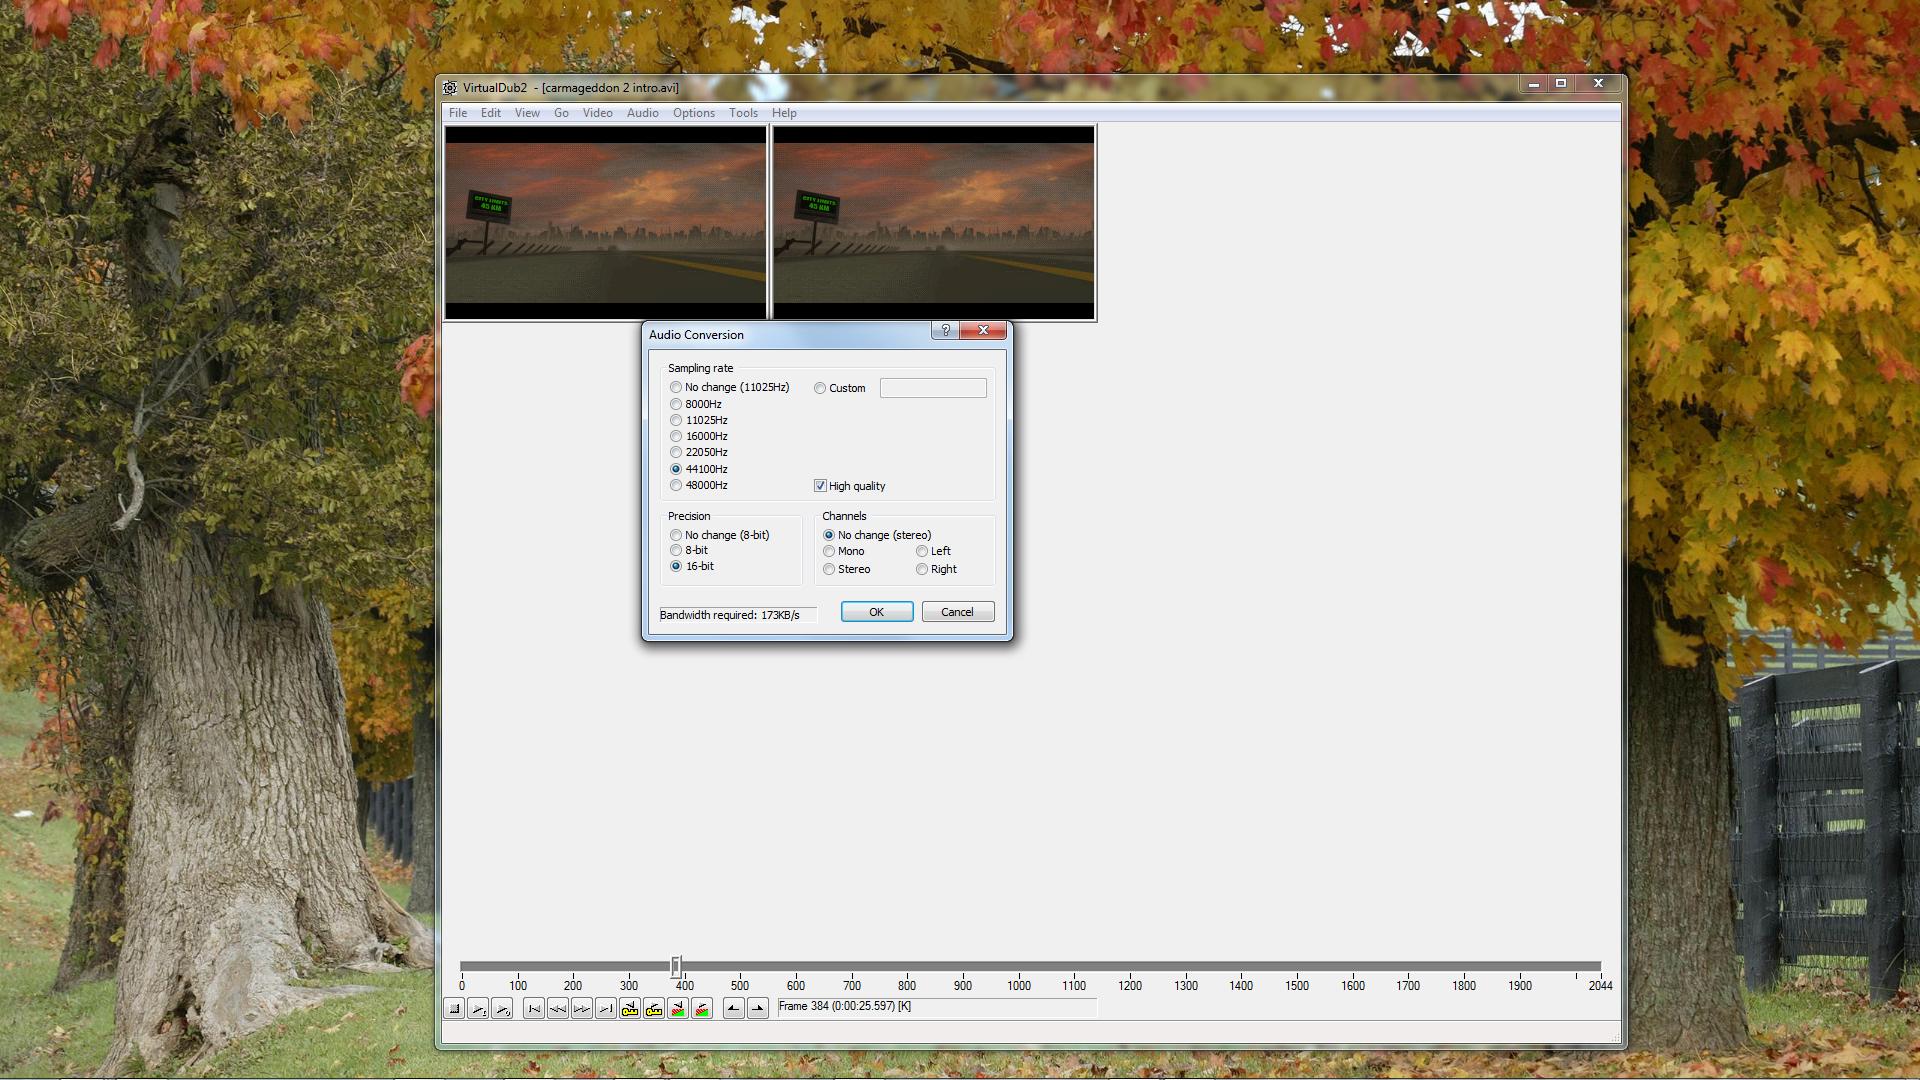 02 - Conversion audio VirtualDub.png